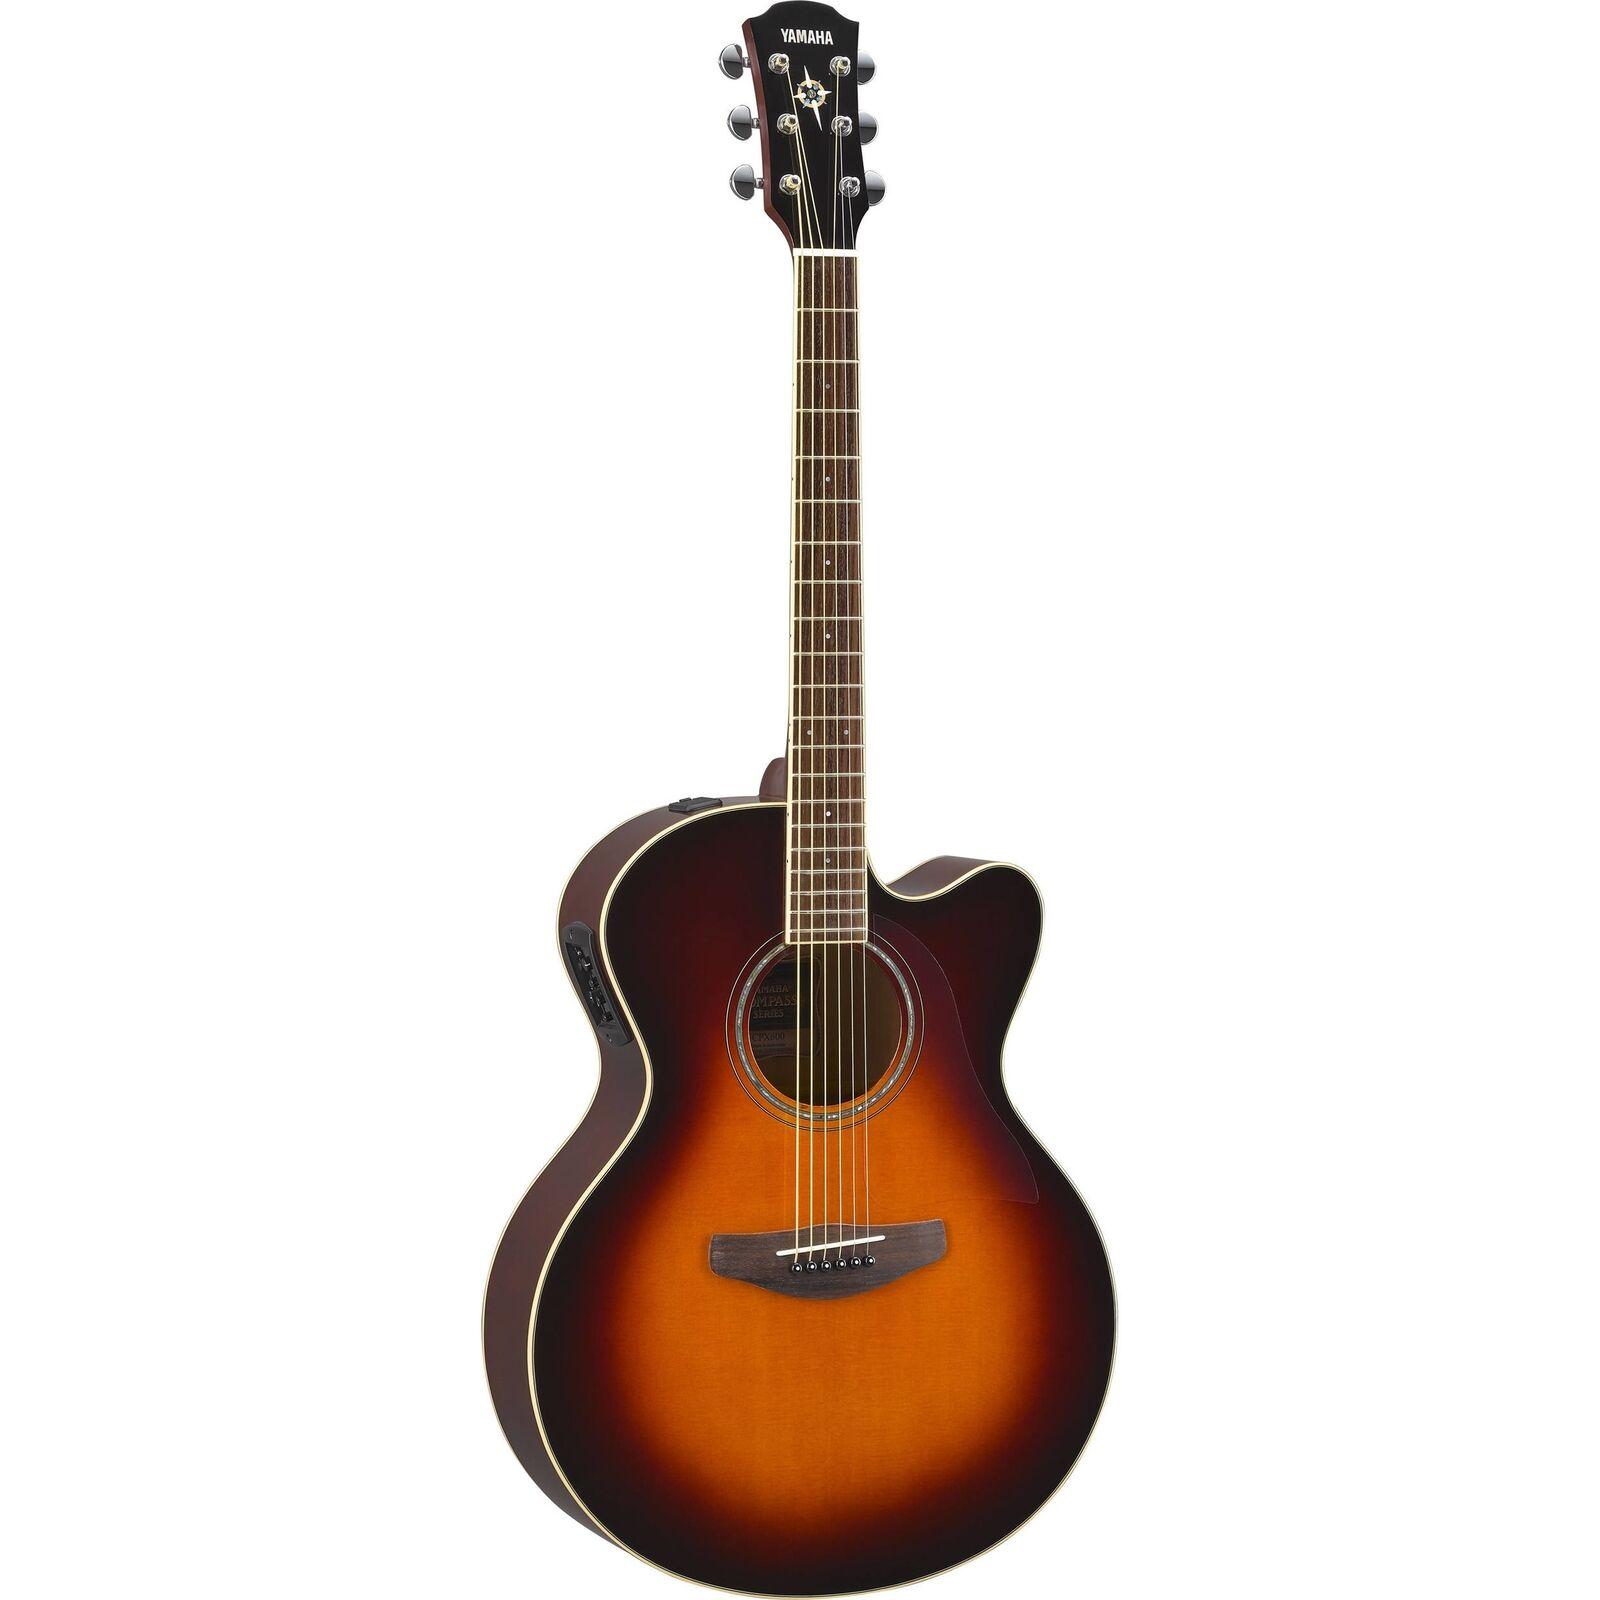 Yamaha Guitarra Acústica CPX600 OVS OVS OVS Antiguo Violín Sunburst electrificado  ahorra hasta un 50%